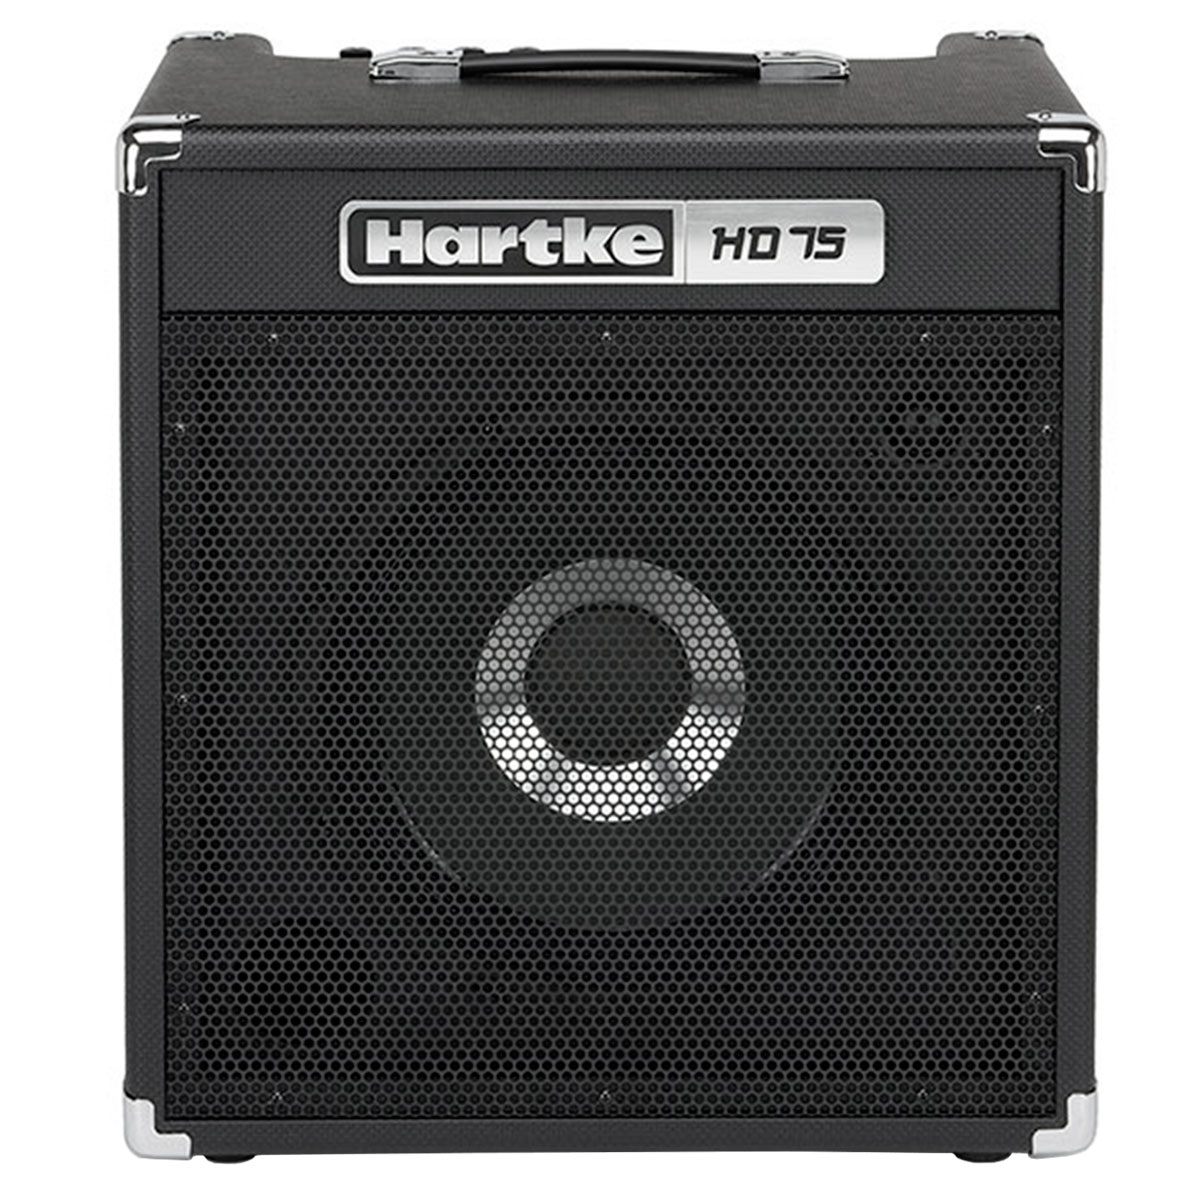 HD75 - Amplificador Combo p/ Contrabaixo HD 75 - Hartke